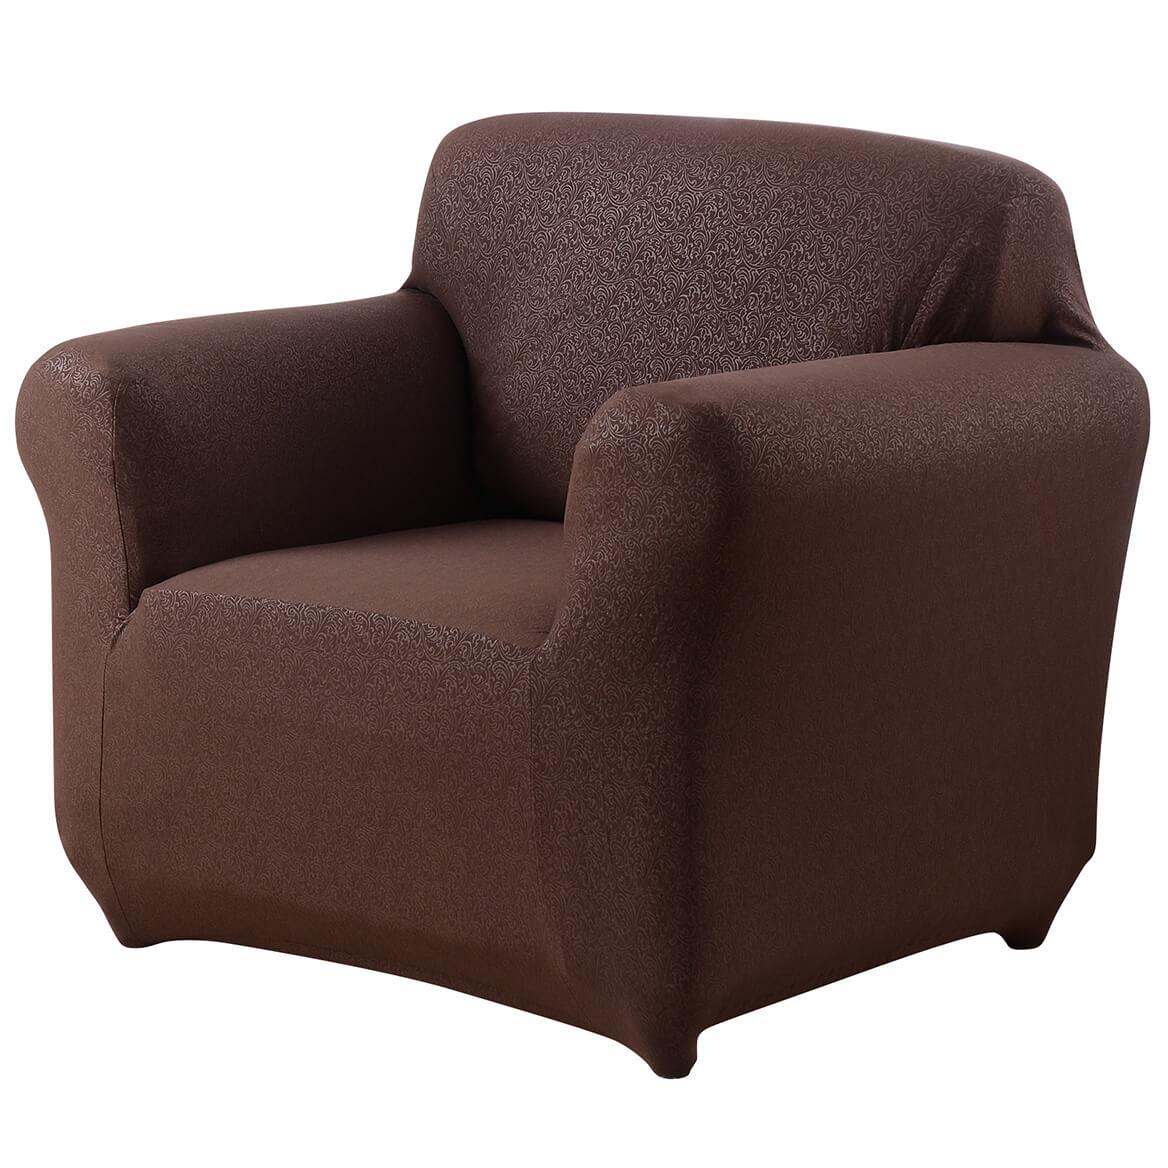 Kathy Ireland Ingenue Chair Slipcover